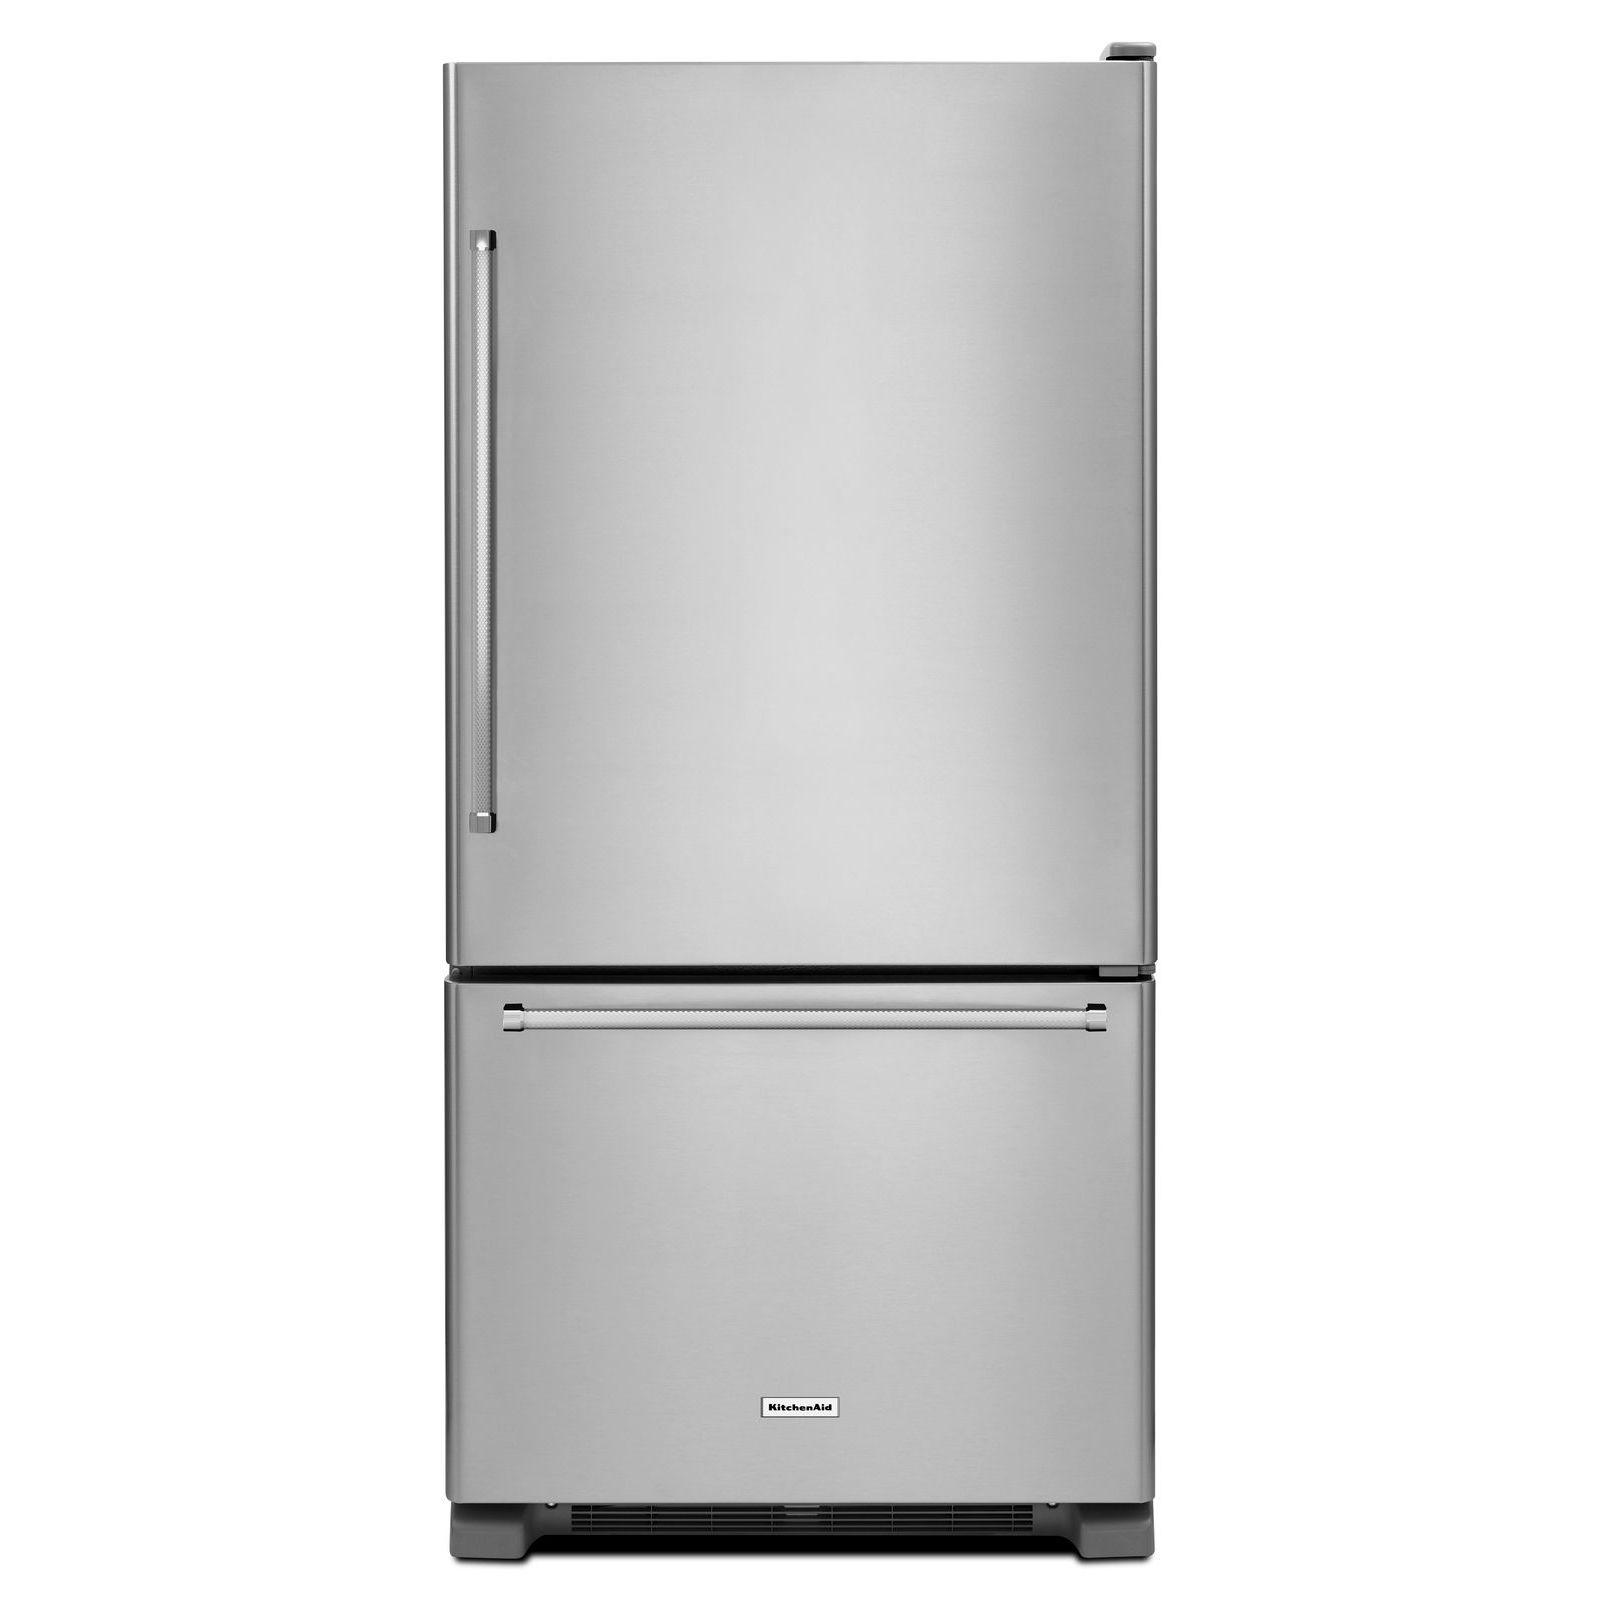 KRBR102ESS-22-cu-ft-Bottom-Mount-Refrigerator-Stainless-Steel